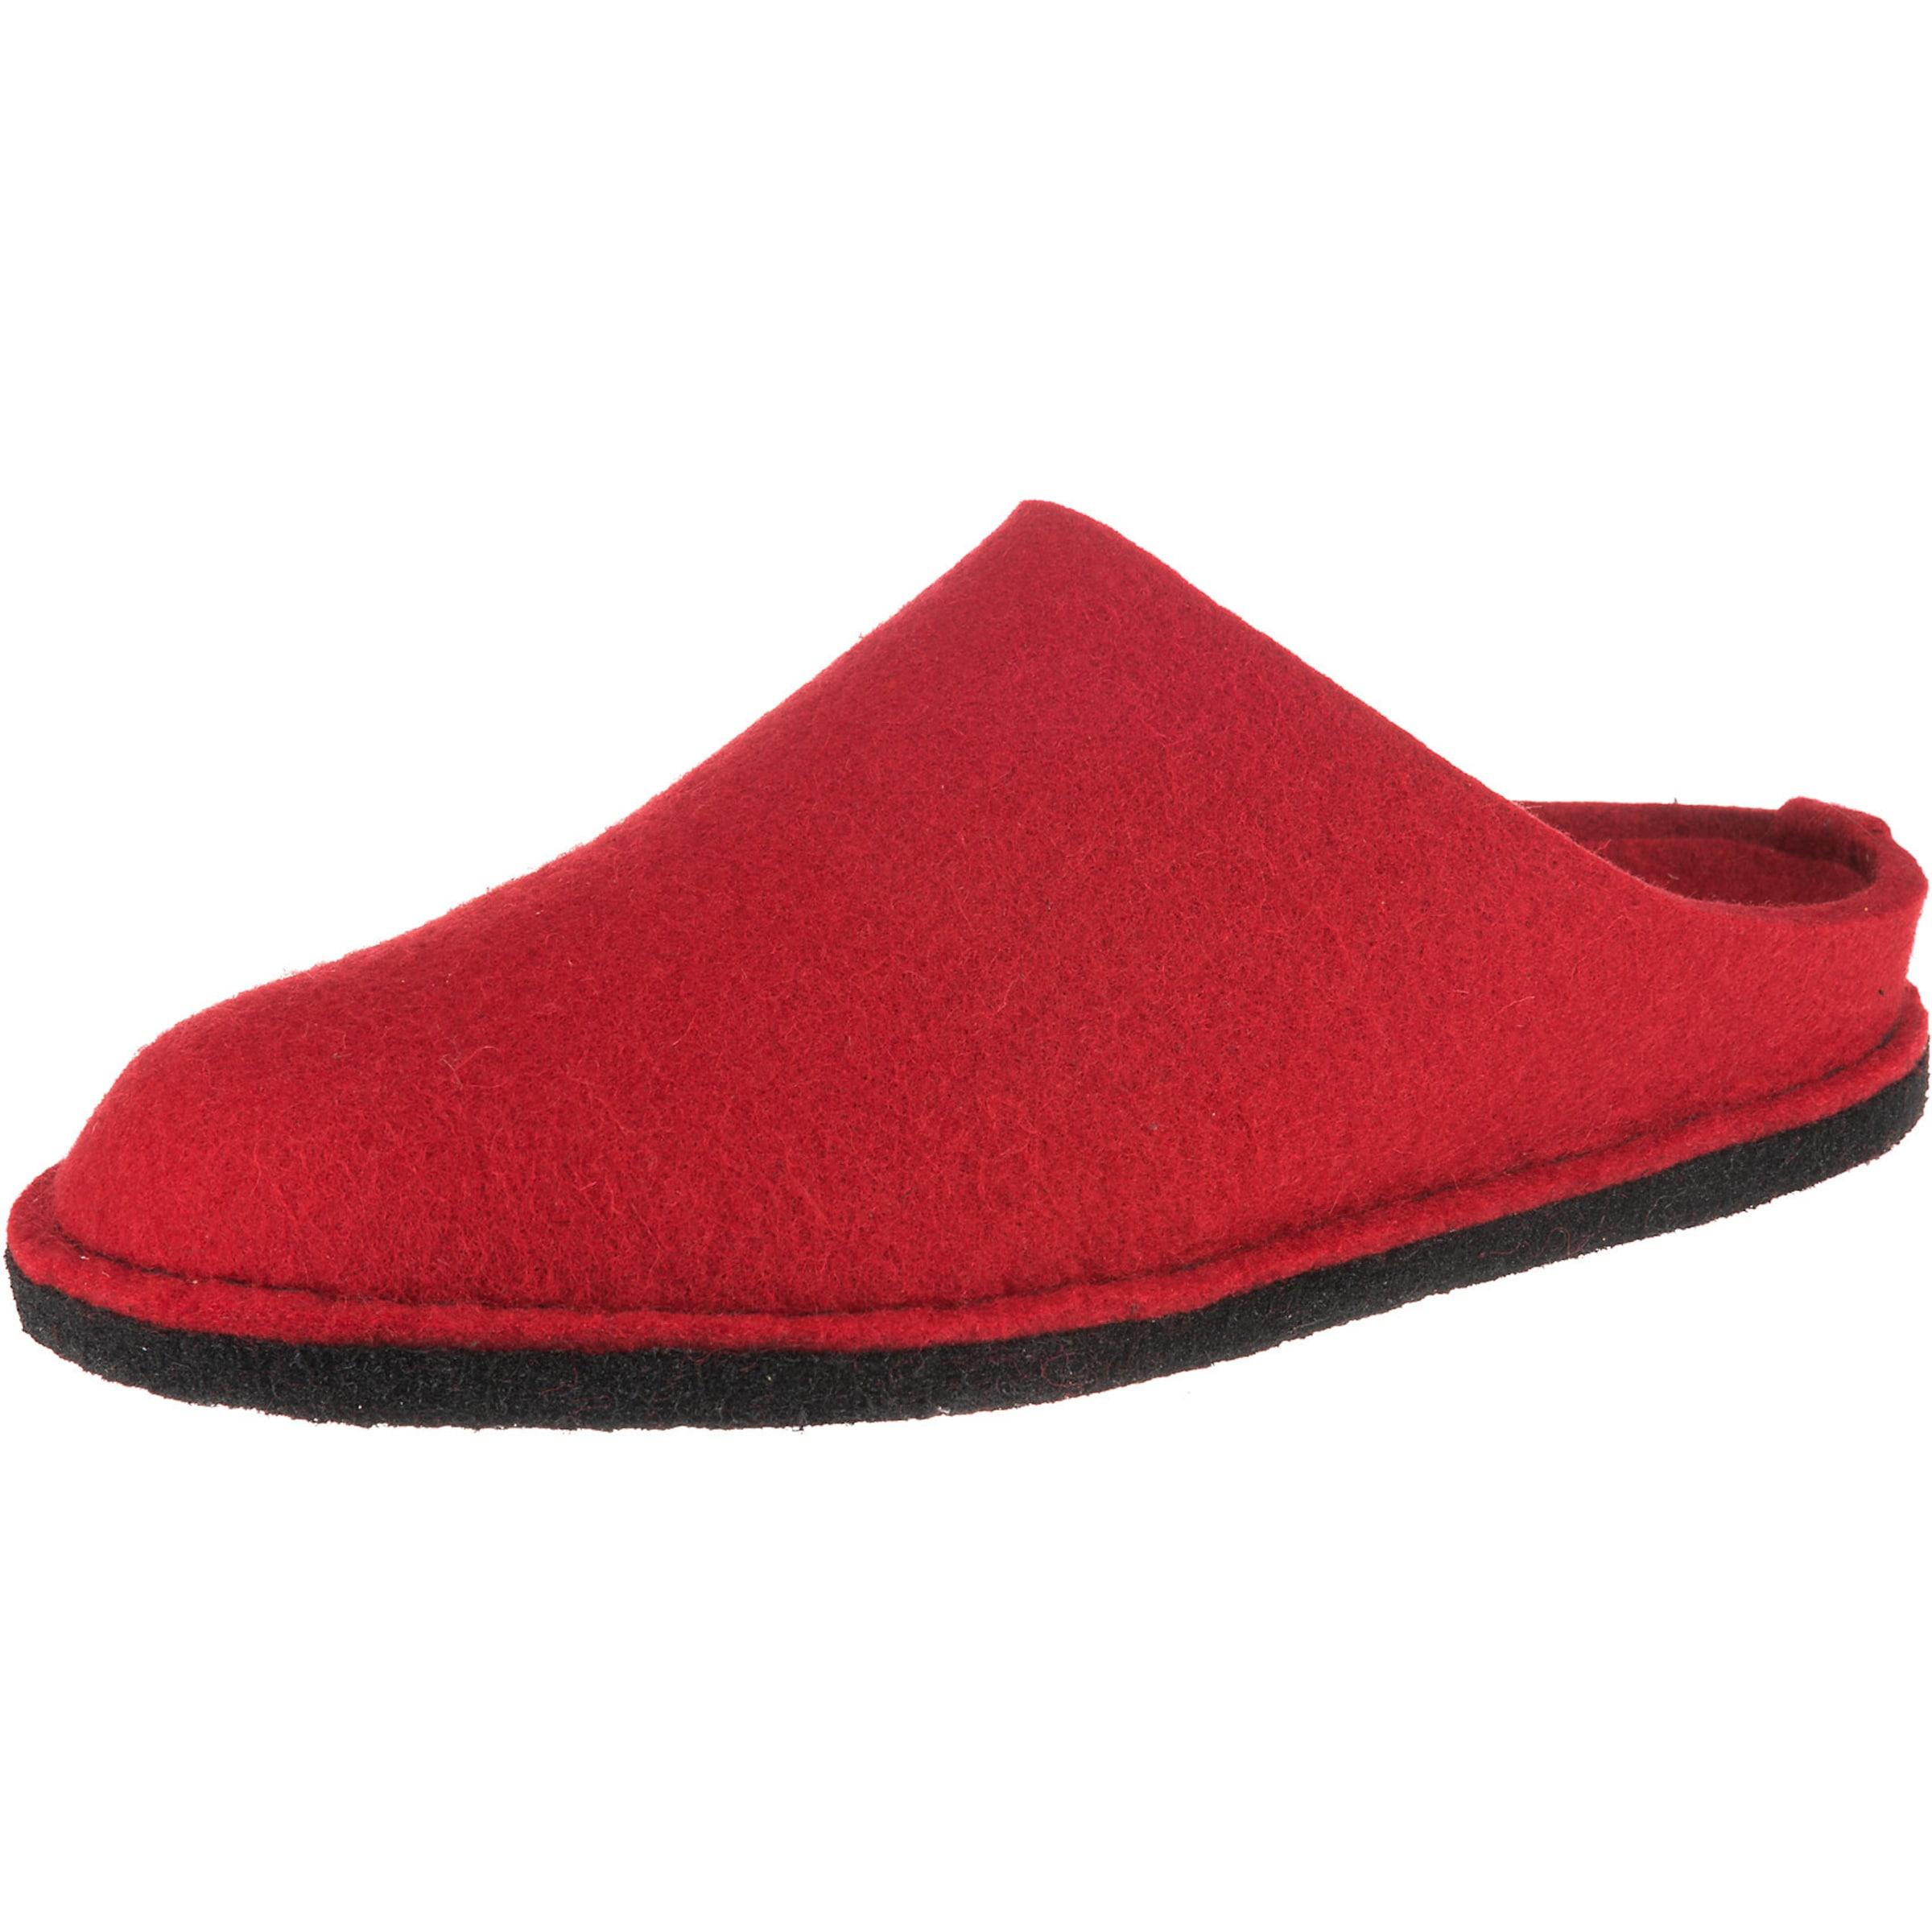 Pantoffeln Pantoffeln Soft Haflinger Rot In Soft In Haflinger Rot I7f6bgmYyv